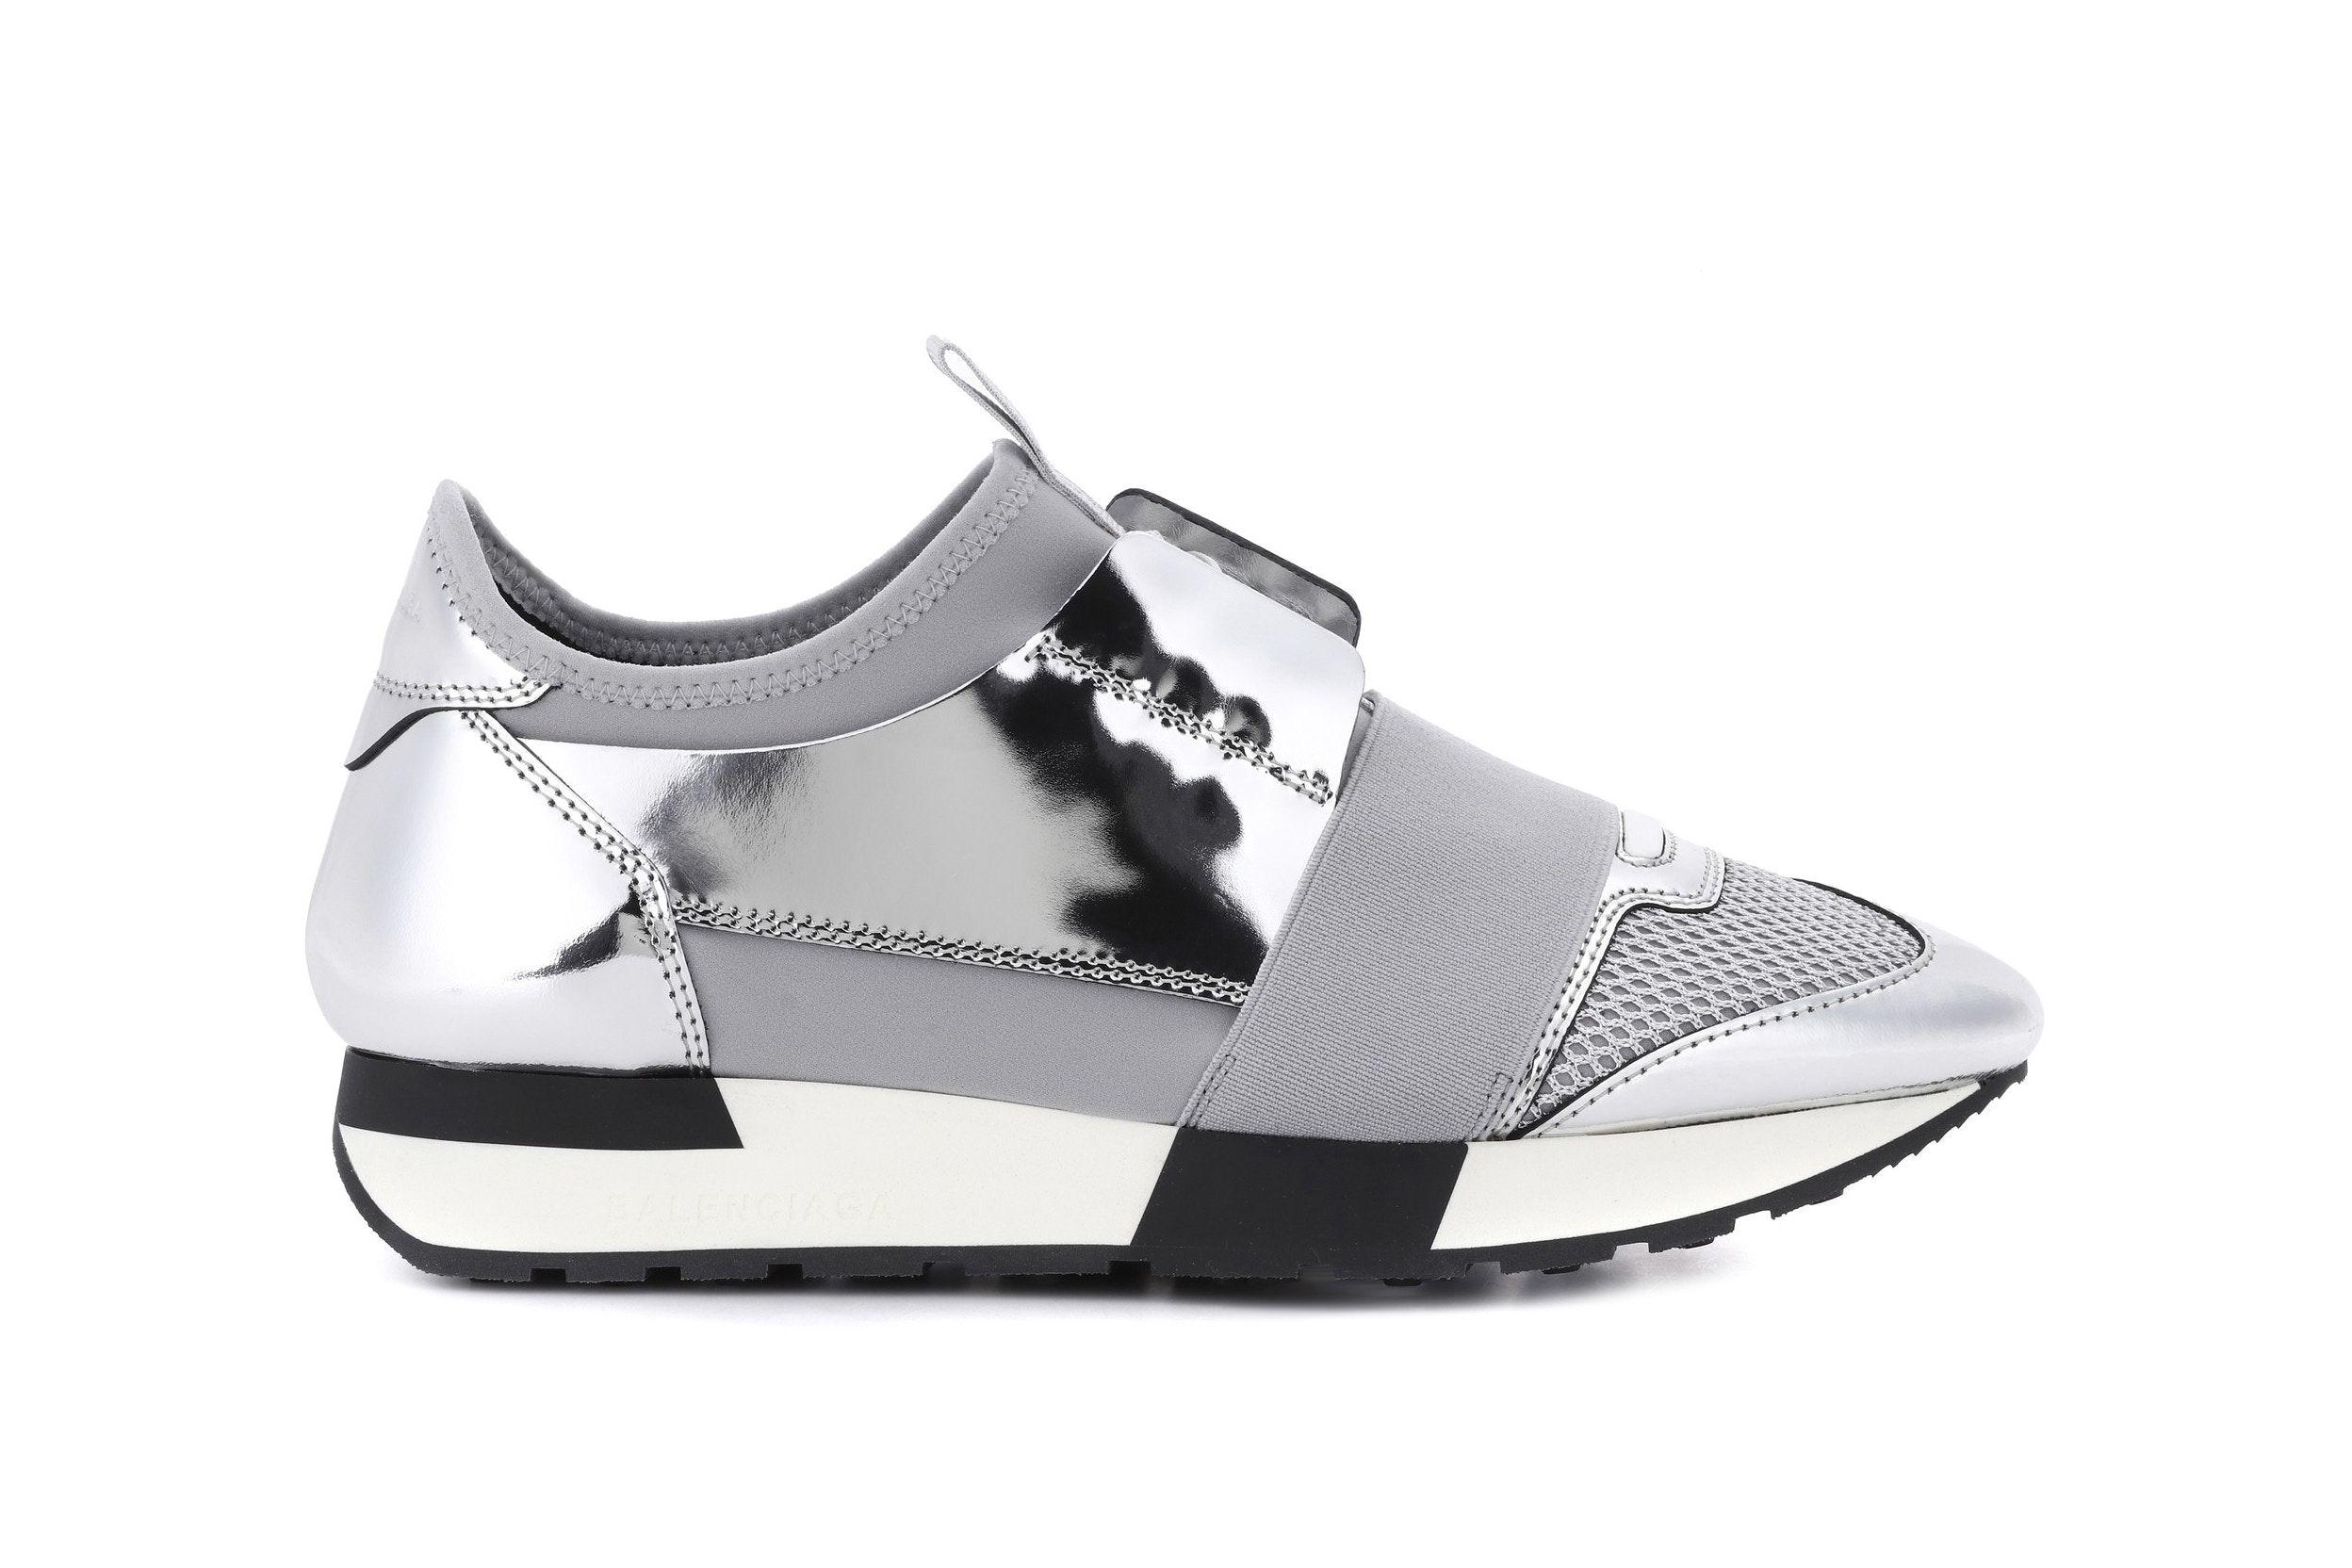 Balenciaga Silver Chrome Race Runner Sneaker Reflective Mirror Lace Up  Shoes Edgy Futuristic 898c828a88